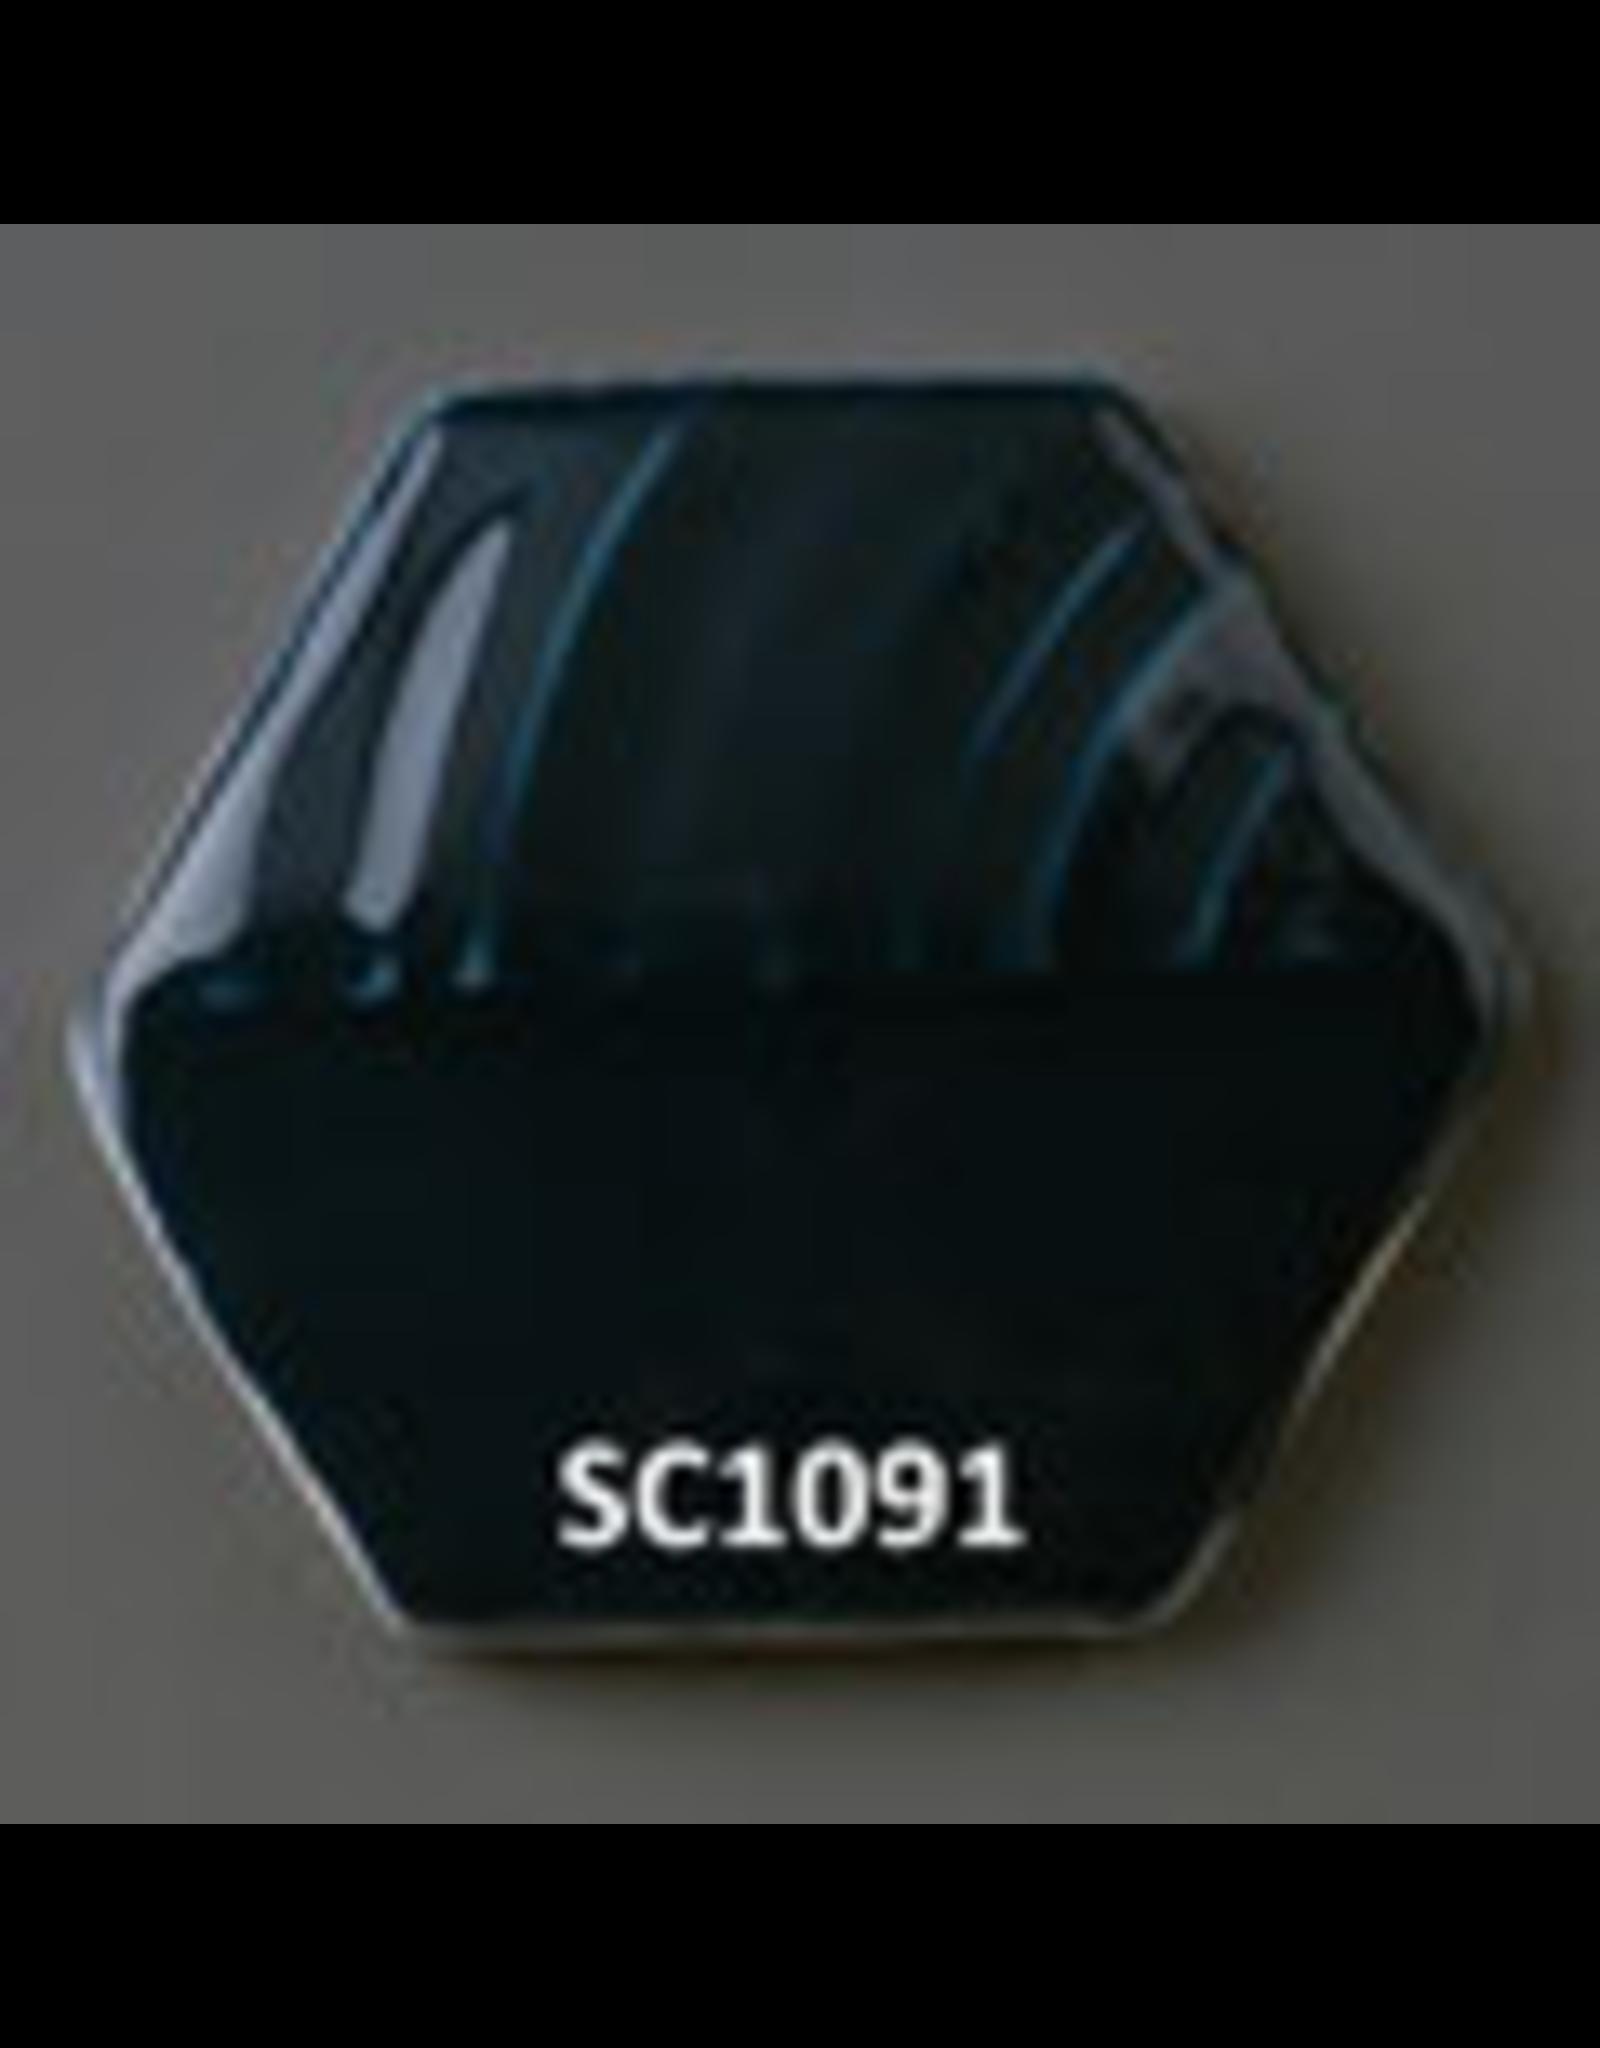 Sneyd Blue Green (Co,Cr,Zn,Al) Stain